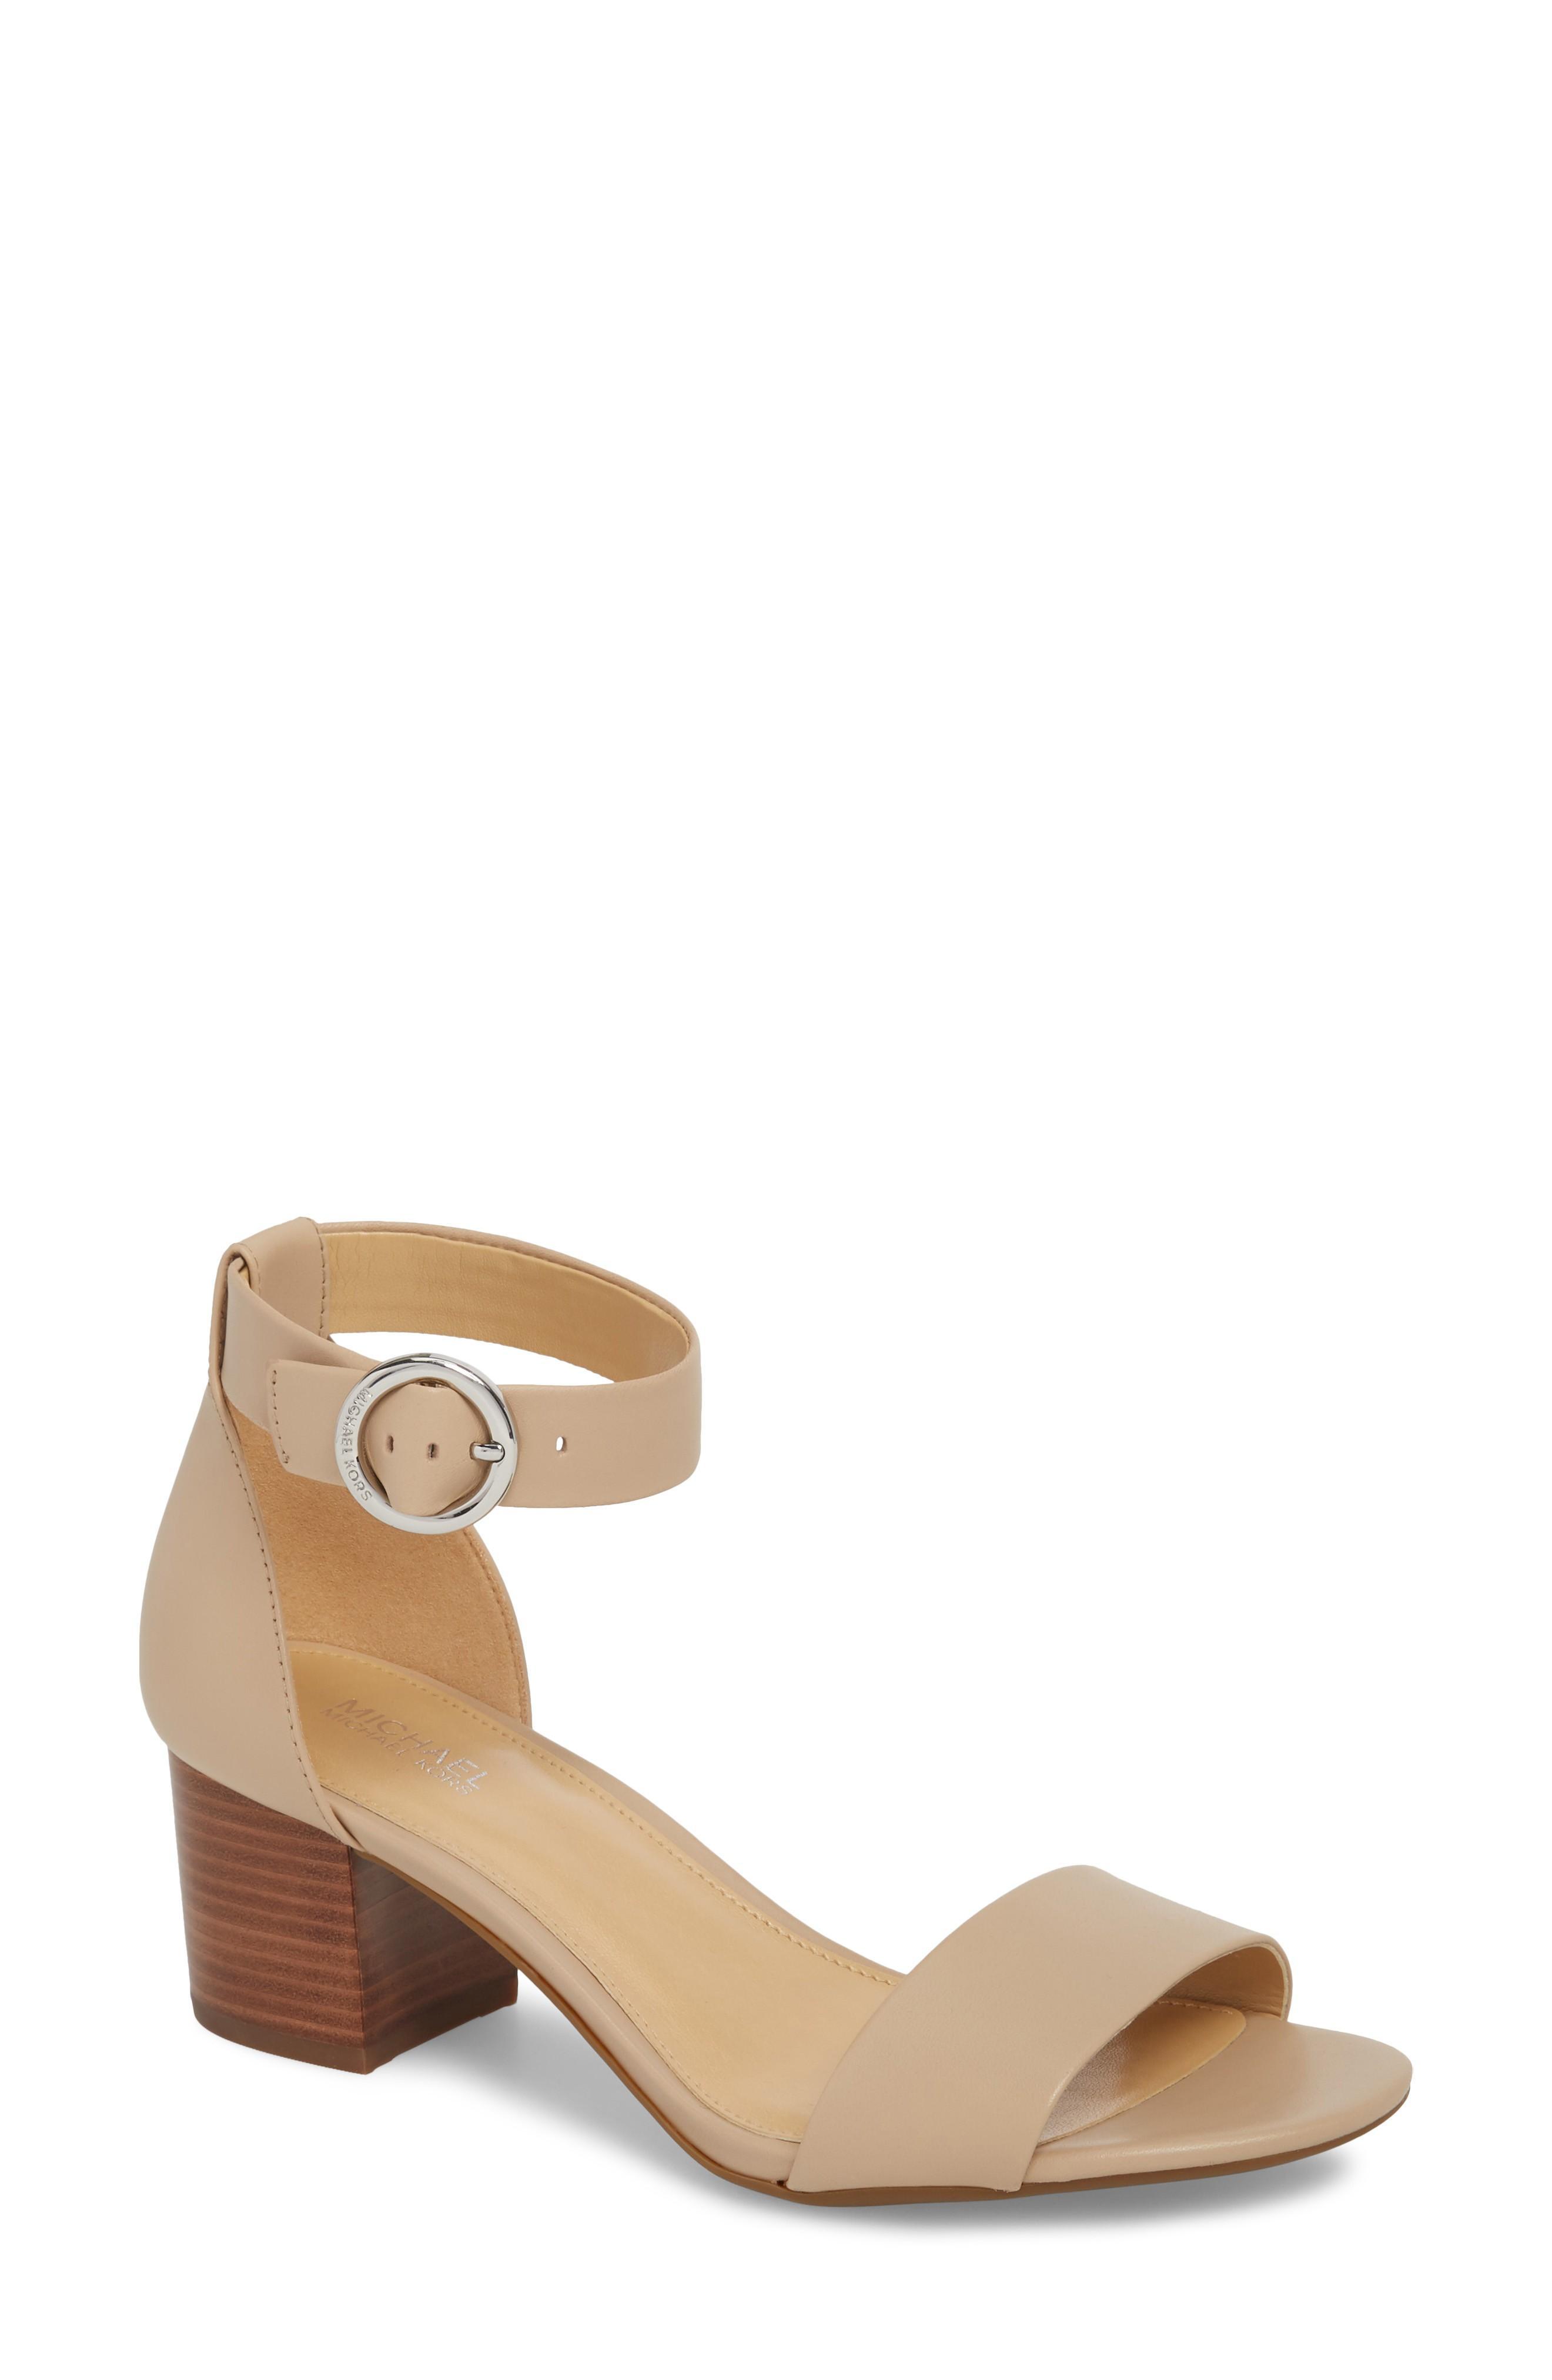 1894c1f699a Michael Michael Kors Lena Block Heel Sandal In Bisque